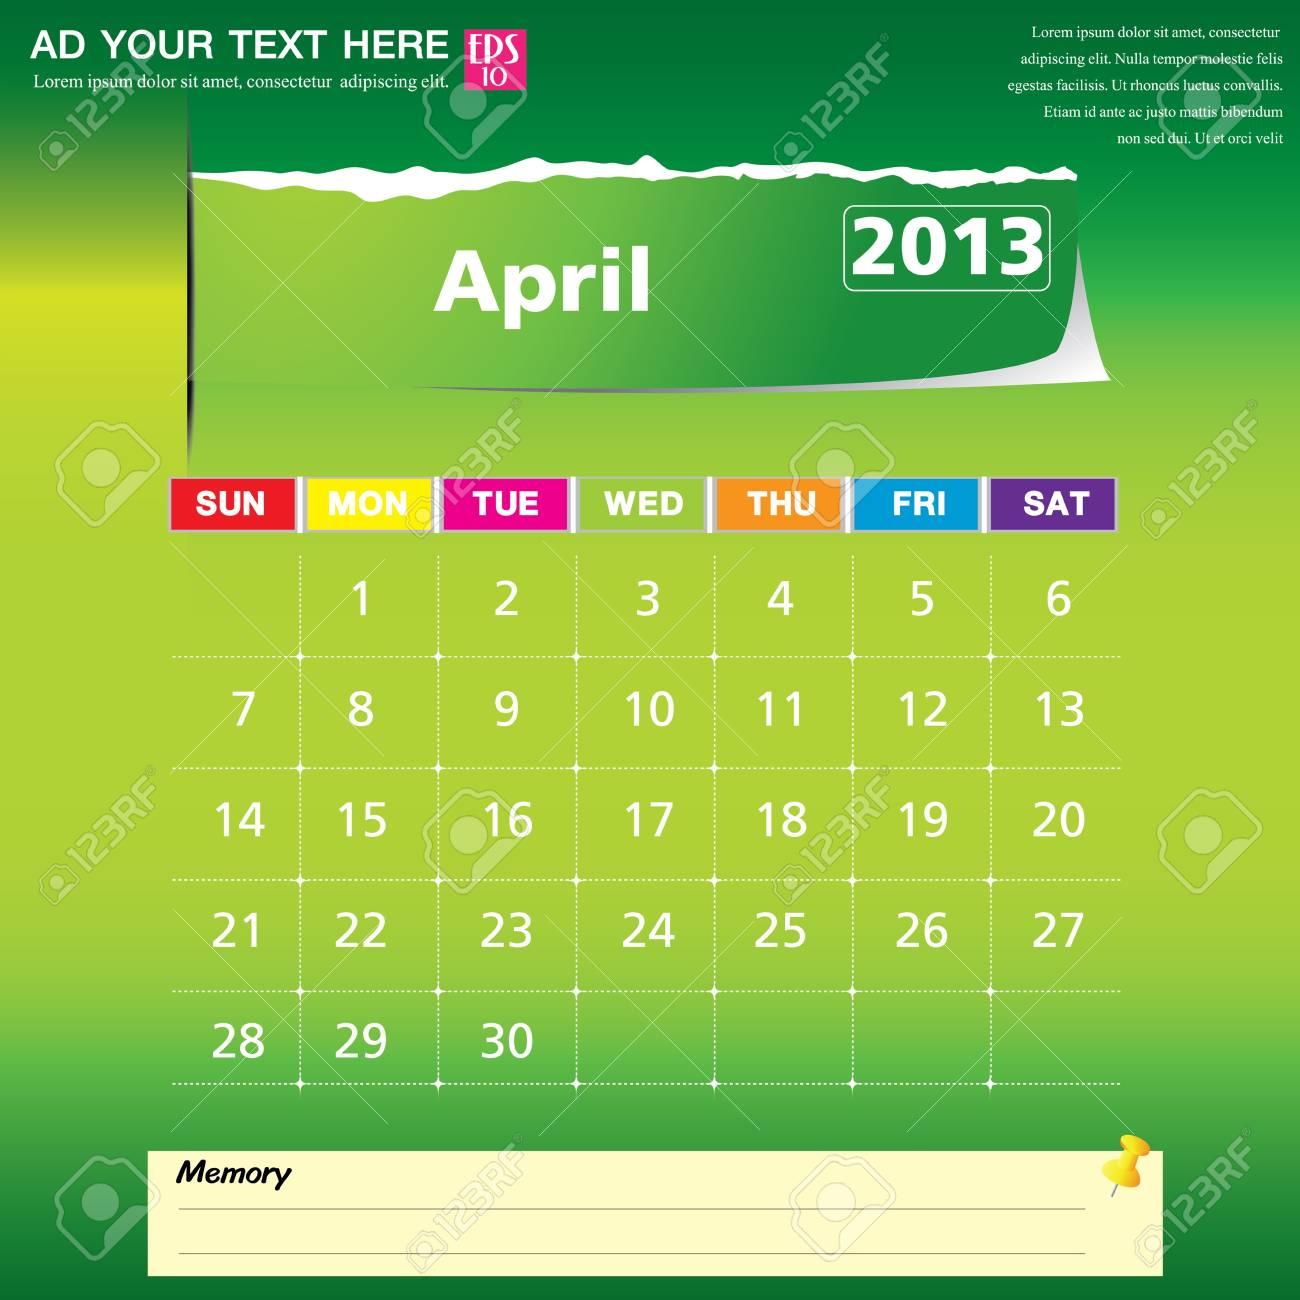 April 2013 calendar vector illustration Stock Vector - 16319380